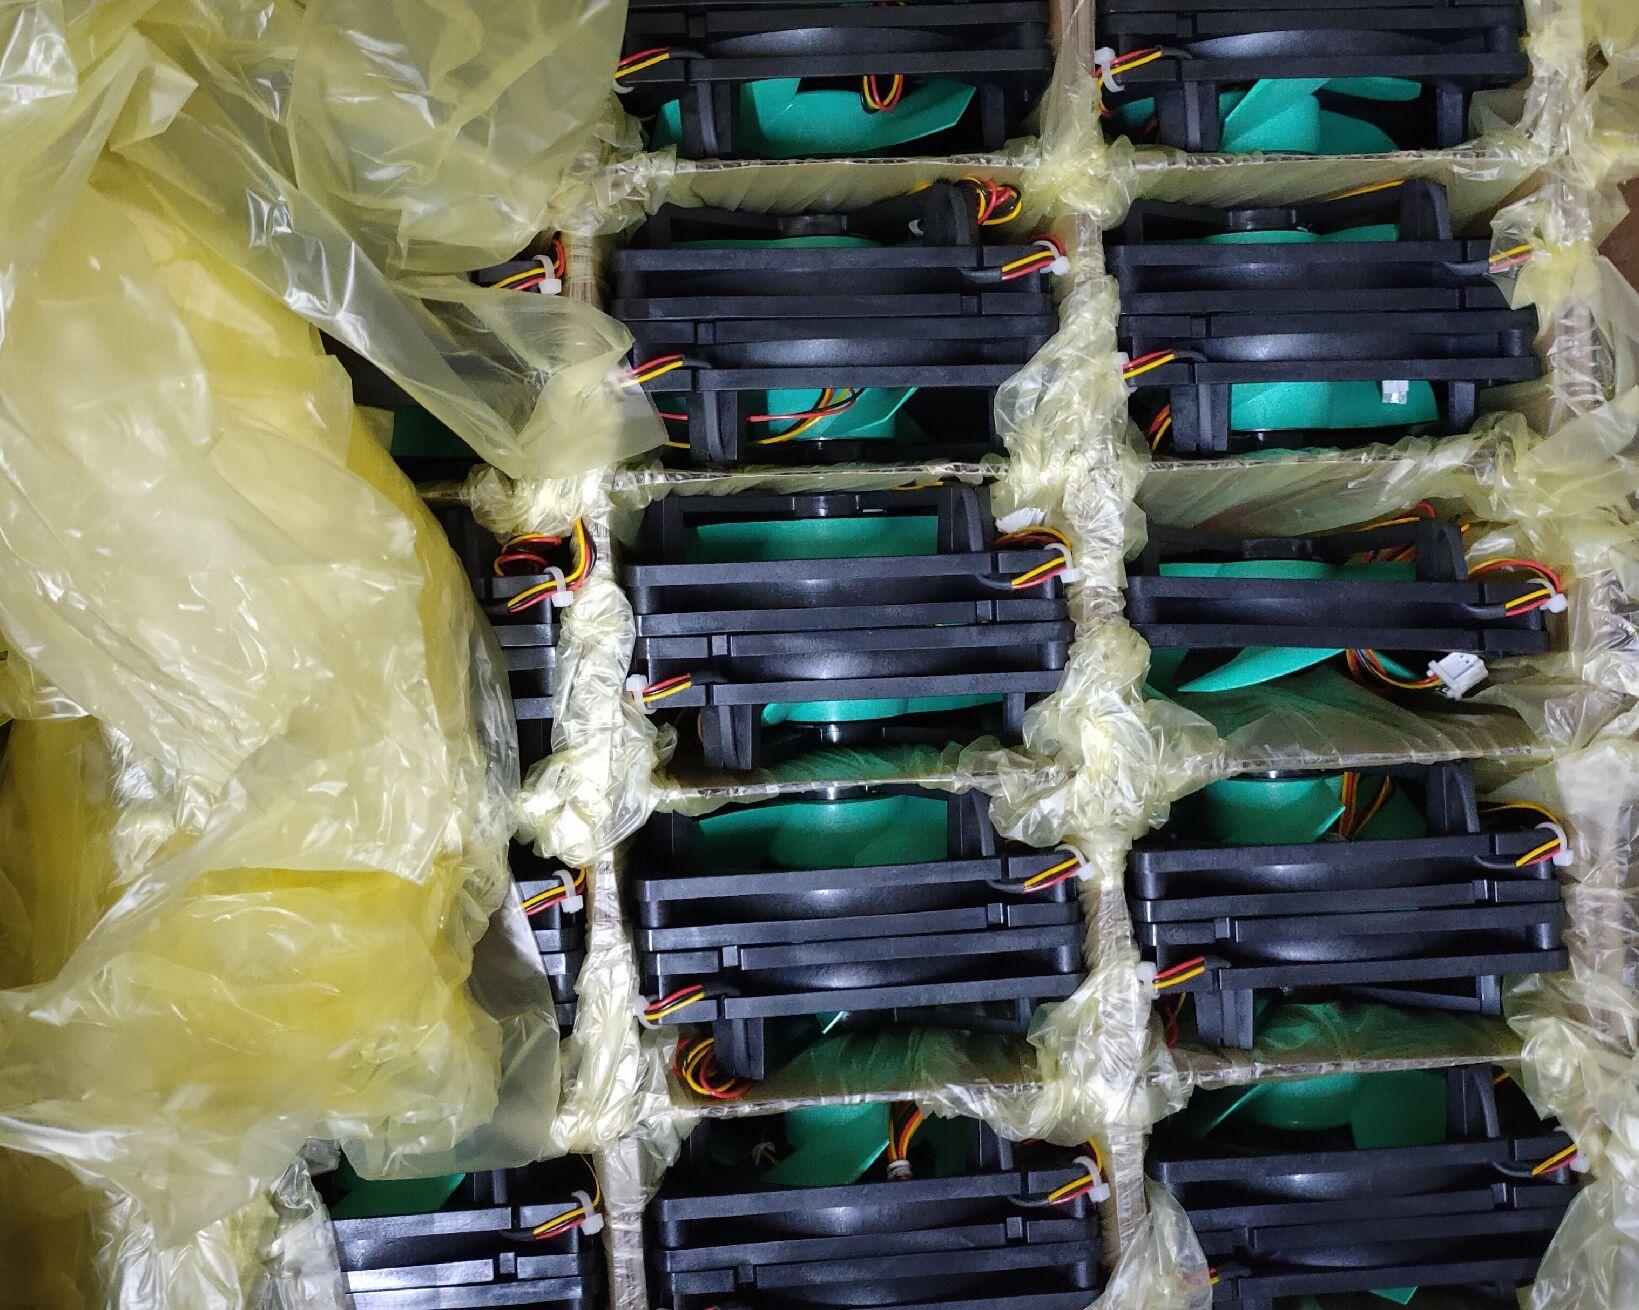 NMB 4715JL-04W-S29 12V 0.23A 3-wires refrigerator fan